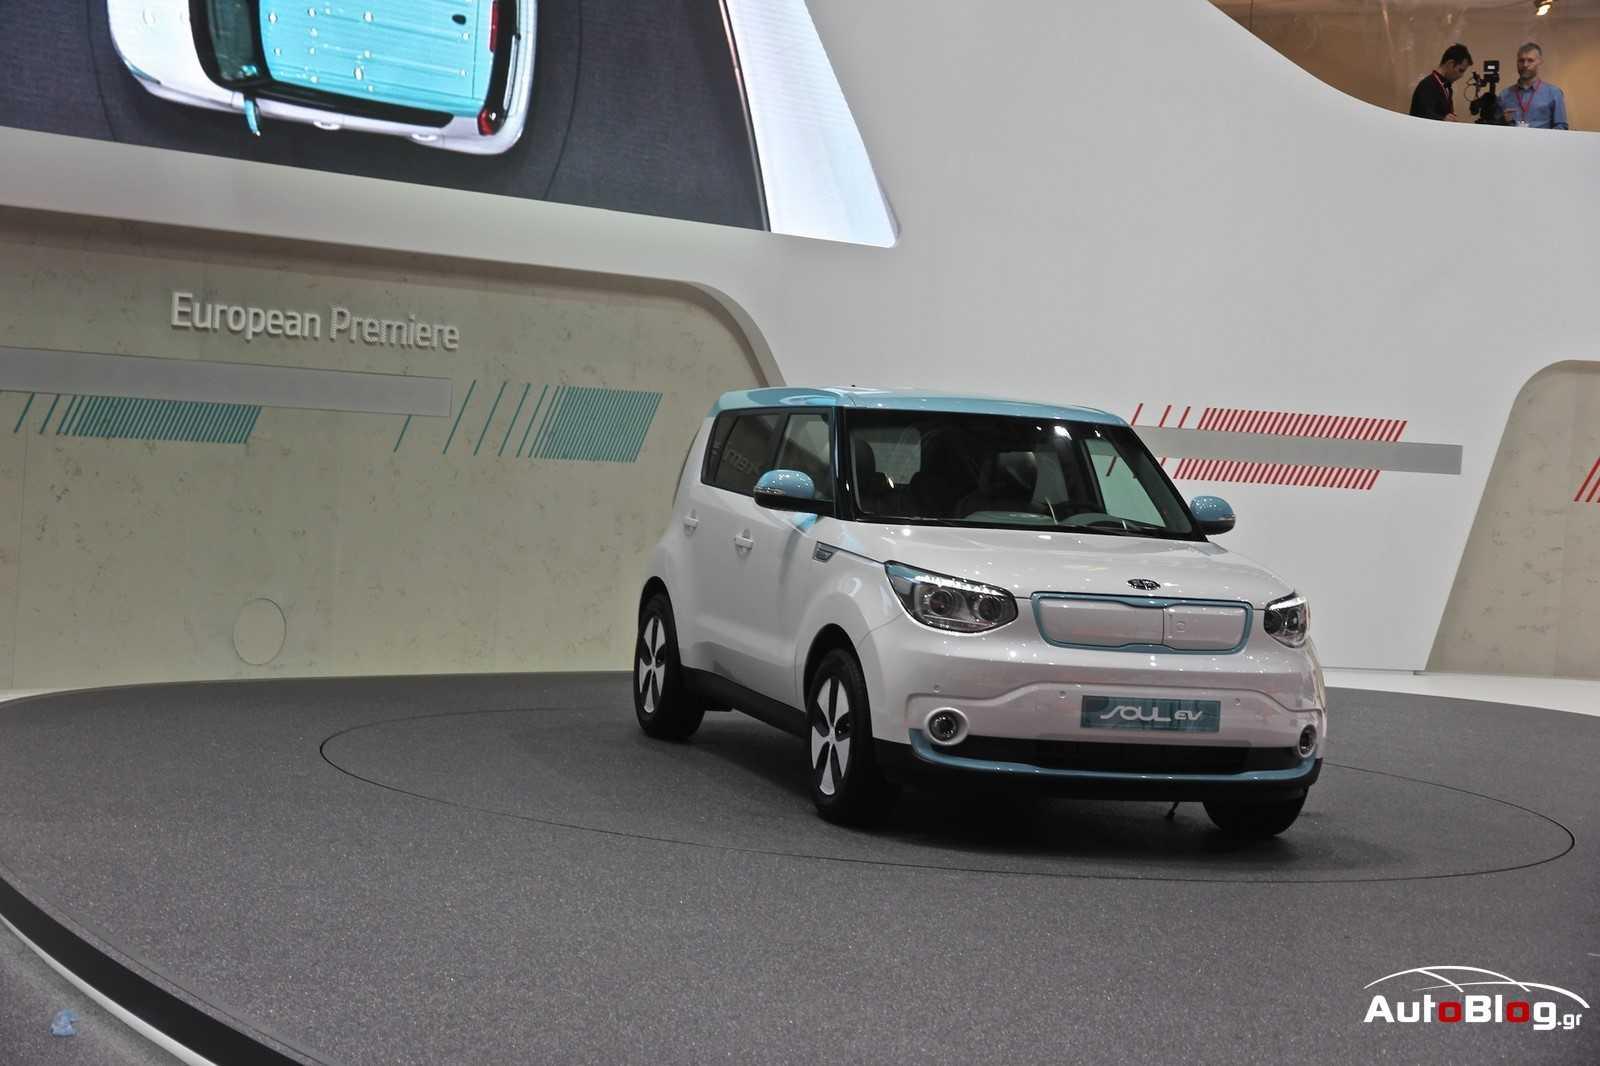 Geneva Motor Show 2014 Preview